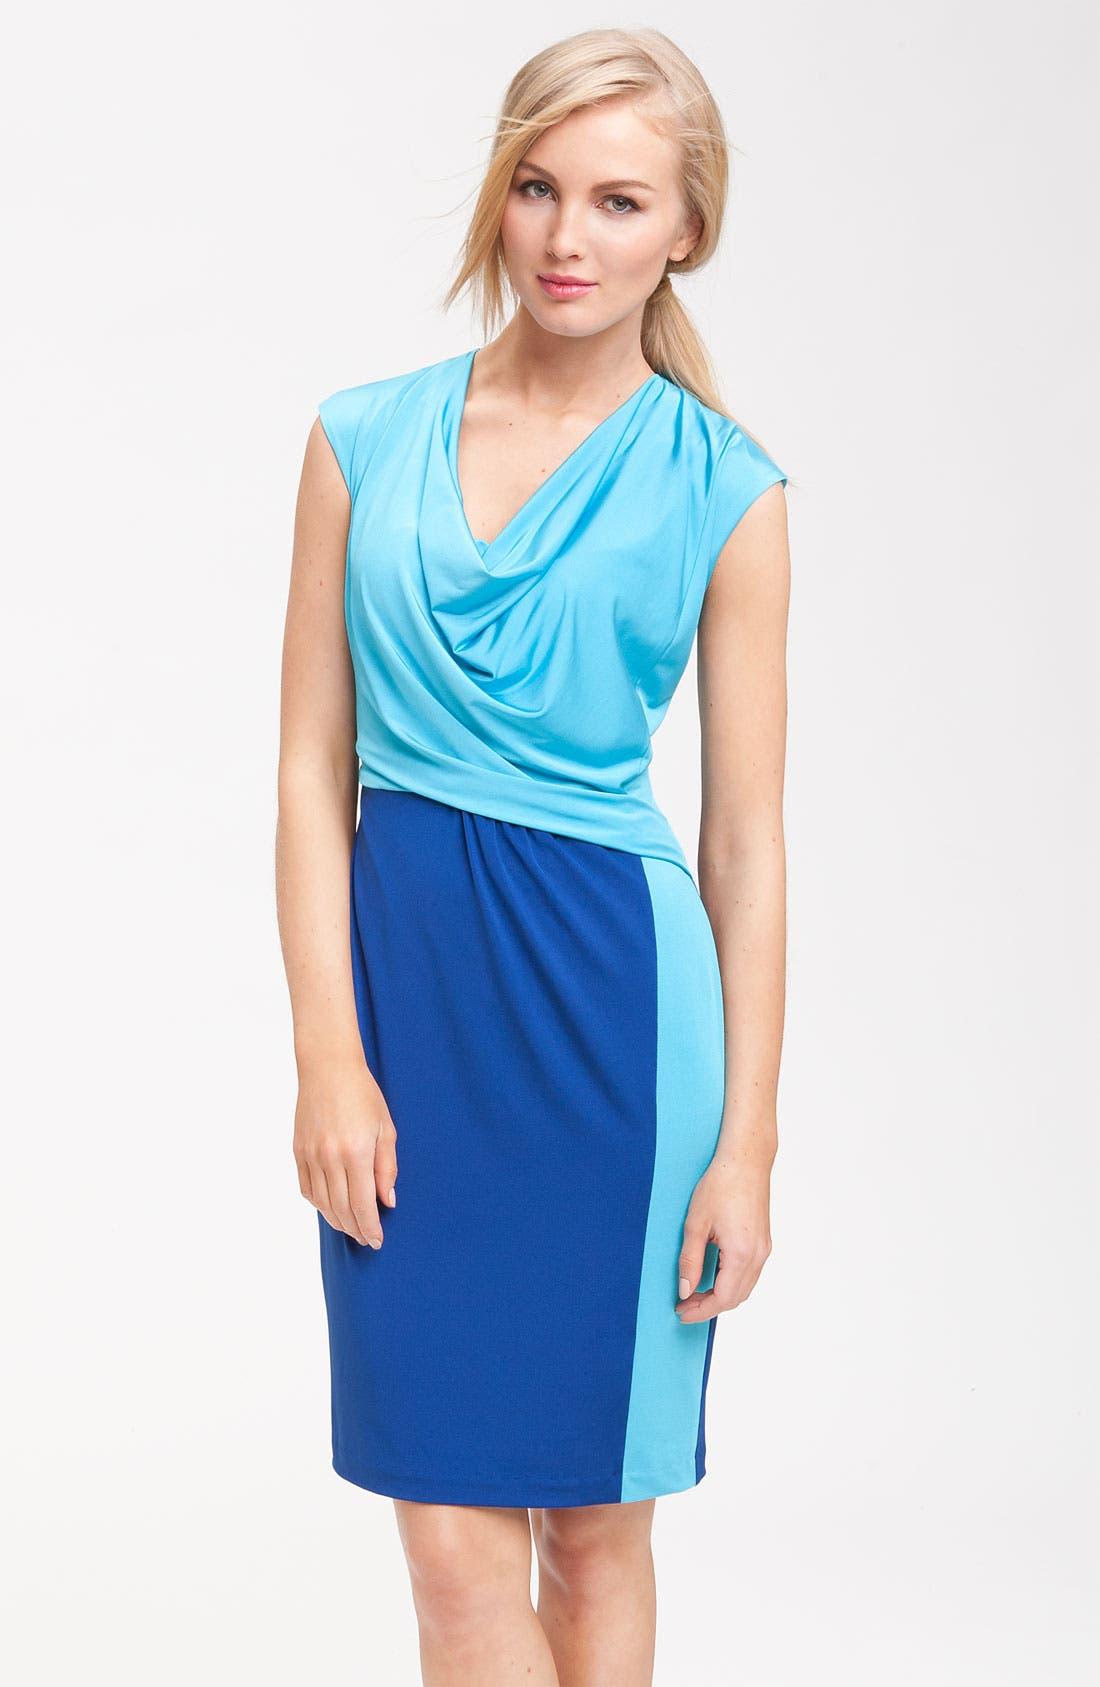 Alternate Image 1 Selected - Donna Ricco Colorblock Draped Dress (Petite)